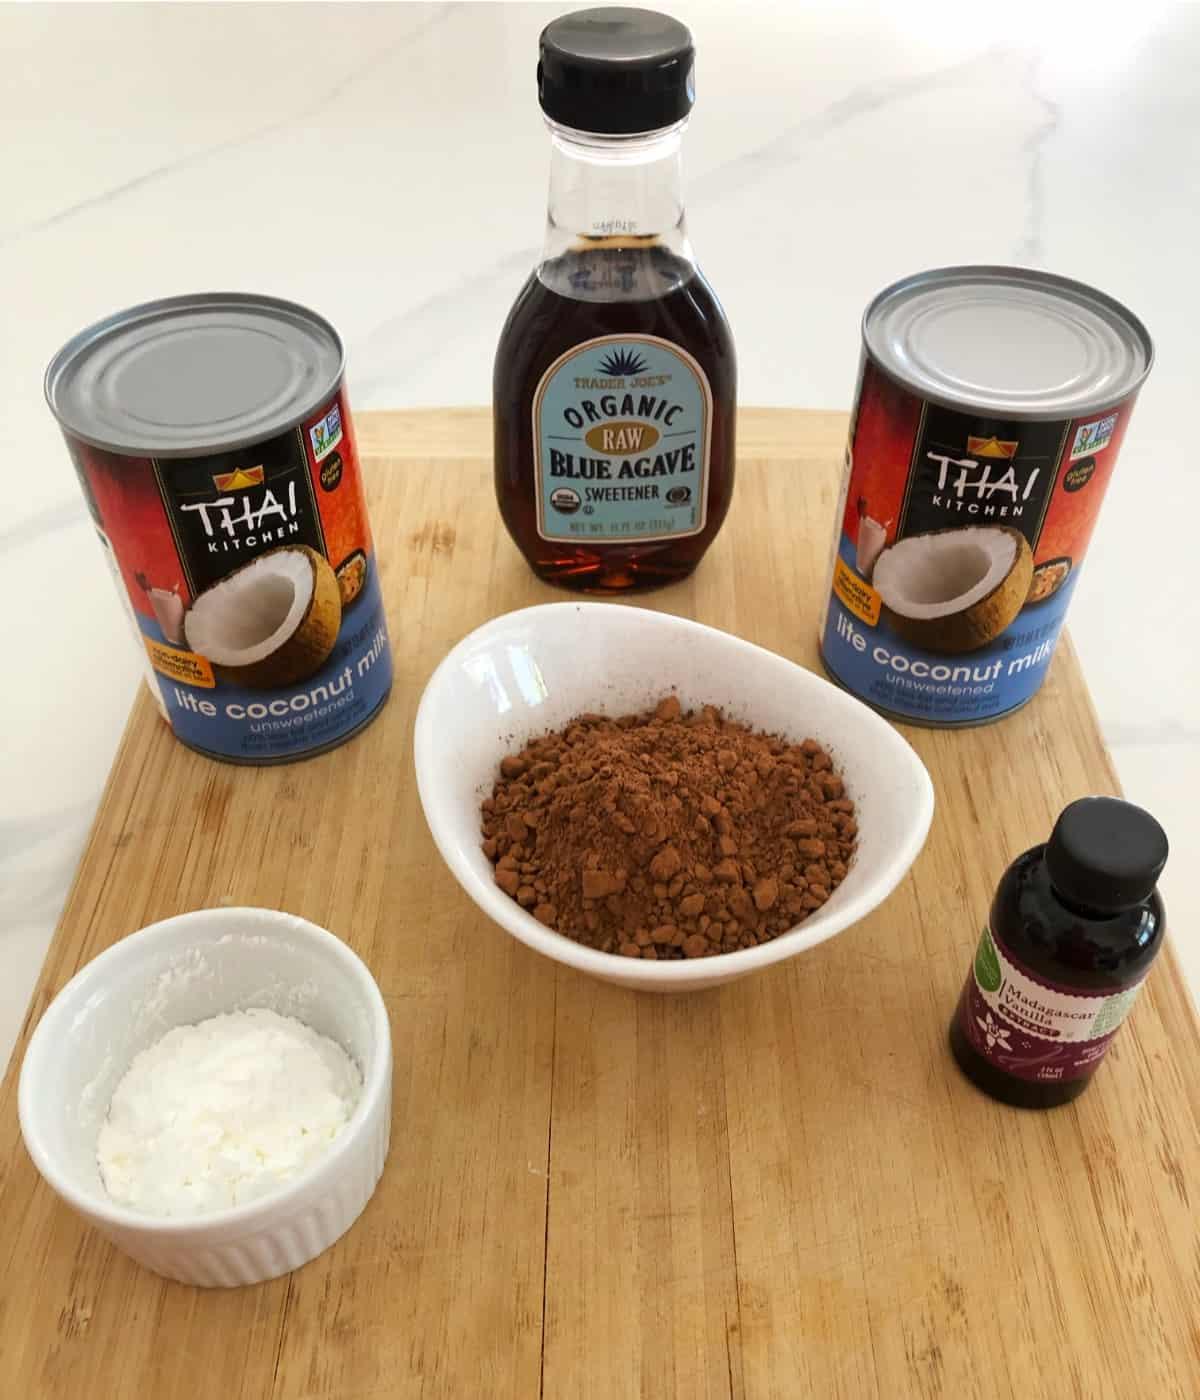 Agave nectar, lite coconut milk, cocoa powder, cornstarch and vanilla extract on bamboo cutting board.